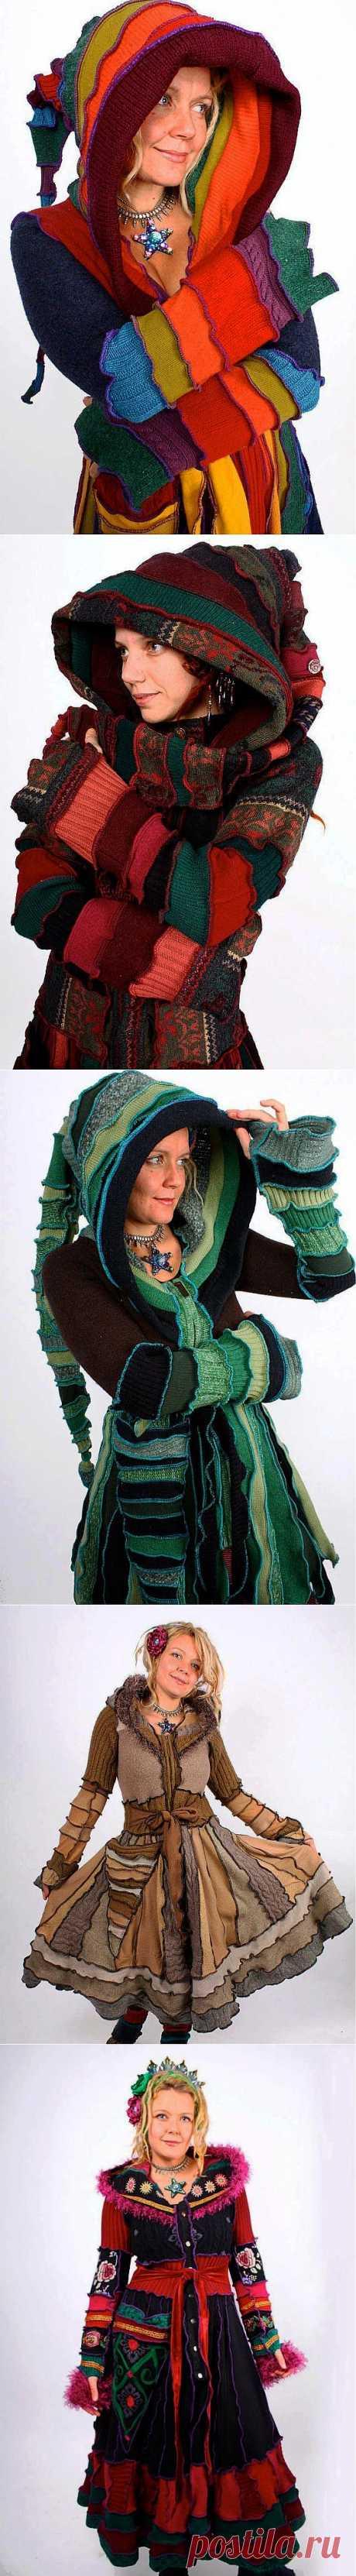 Katwise - чумовая рукодельница из Нью-Йорка.